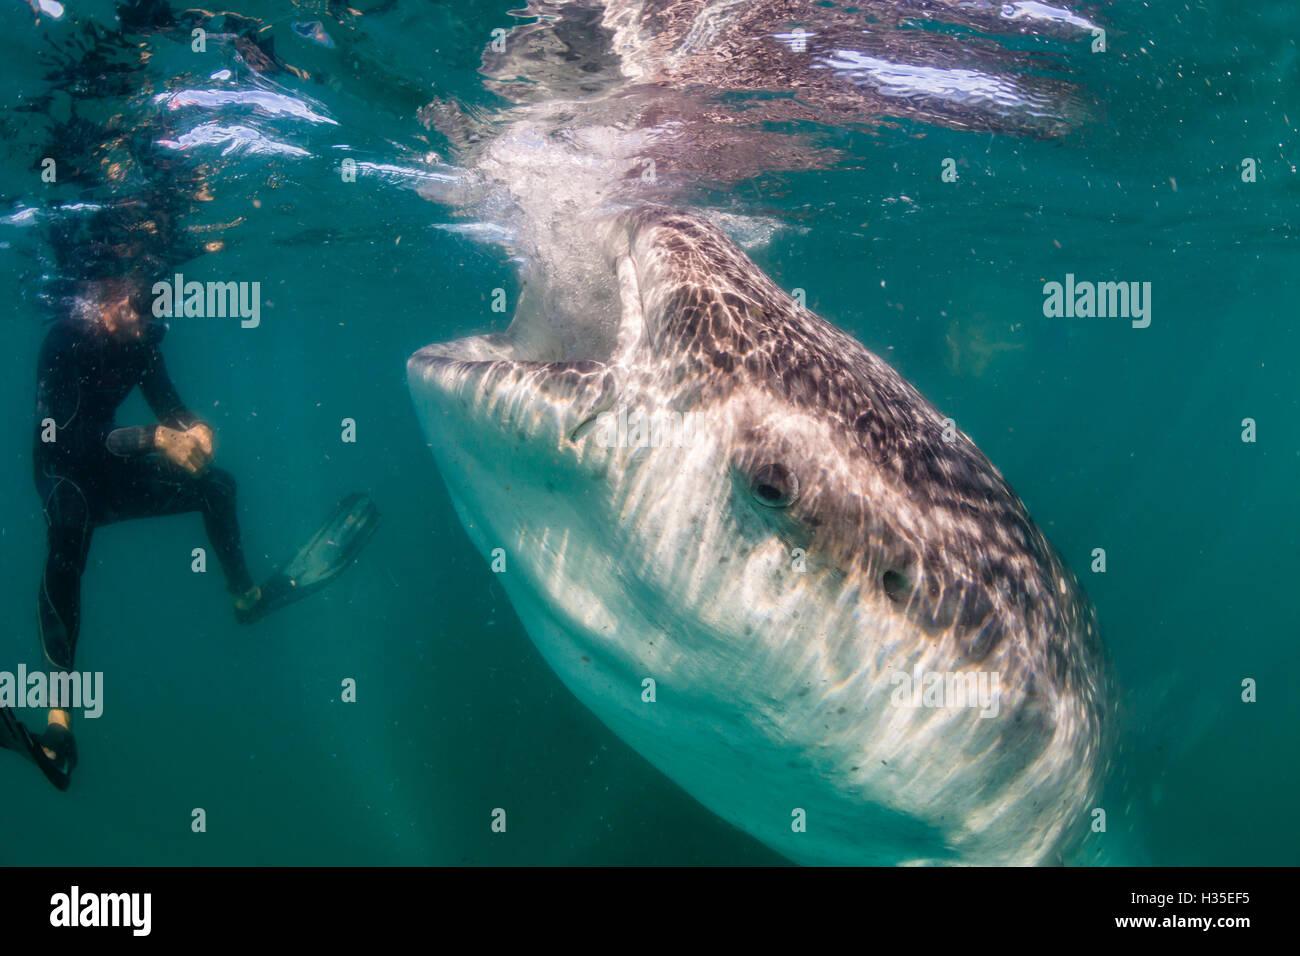 Whale shark (Rhincodon typus) underwater with snorkelers off El Mogote, near La Paz, Baja California Sur, Mexico - Stock Image